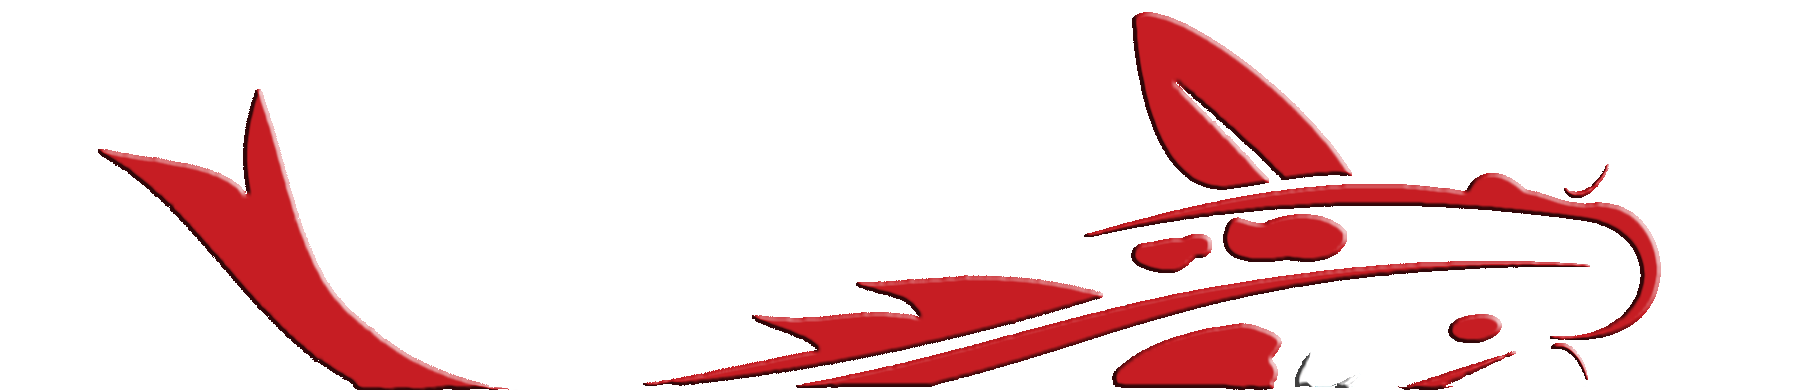 Koi Outline red bevel.png